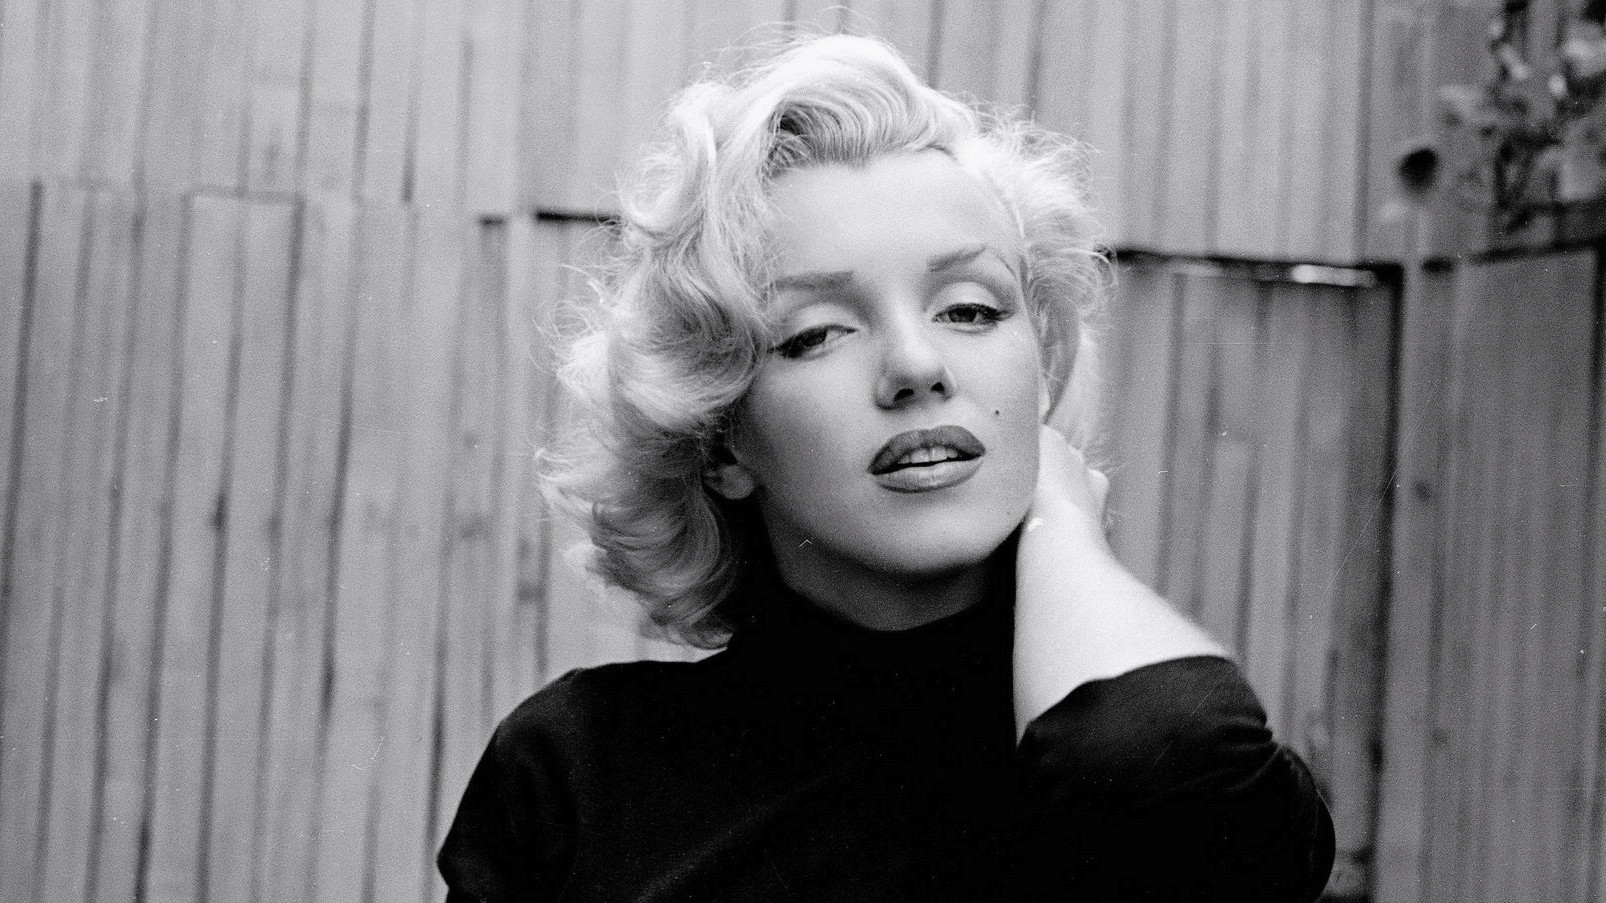 Marilyn Monroe Feature Image © Siddhesh Mangela/Flickr